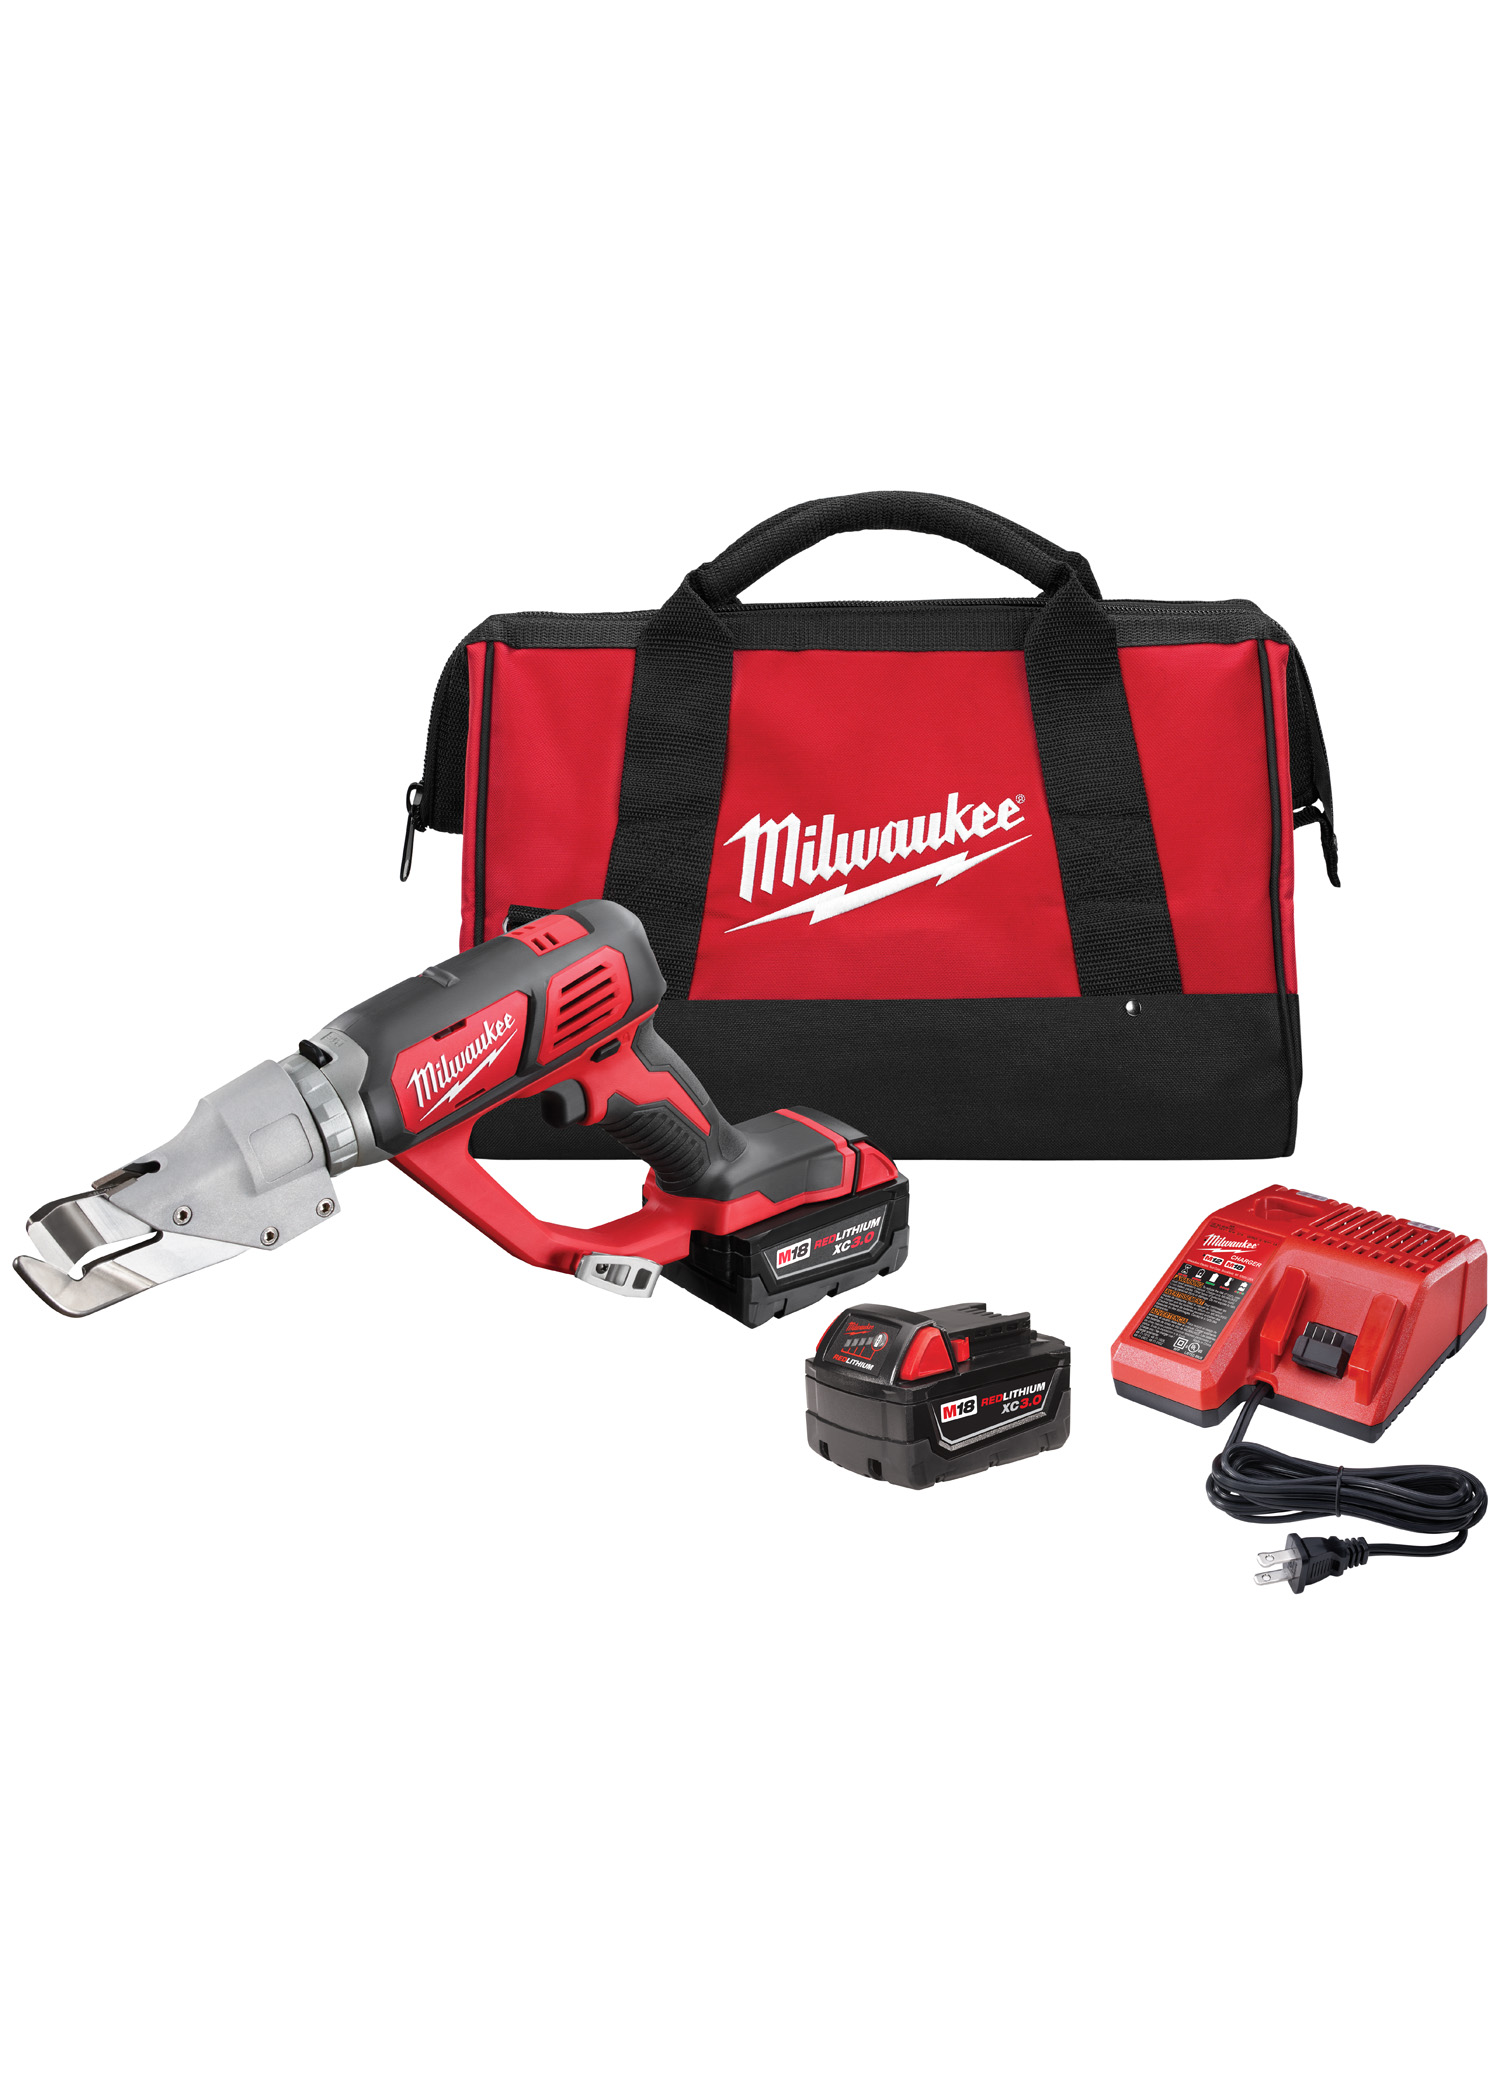 Milwaukee 2637-22 M18™ Cordless 18 Gauge Single Cut Shear - Kit